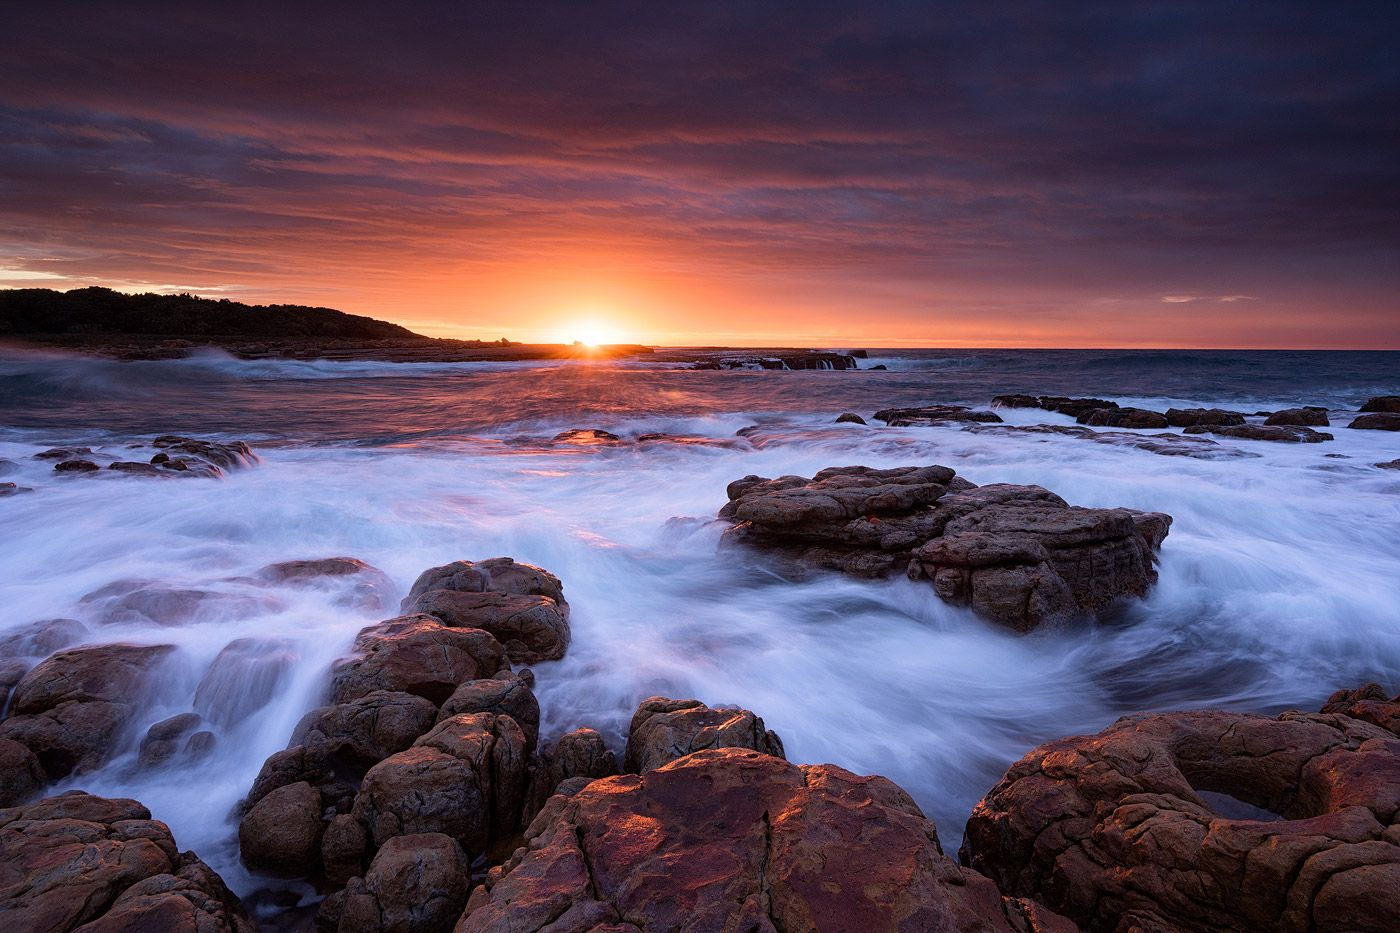 Wild Coast Seascape Sunrise South Africa Pondoland Wild Coast South Africa Landscape Photos South Africa Landscape